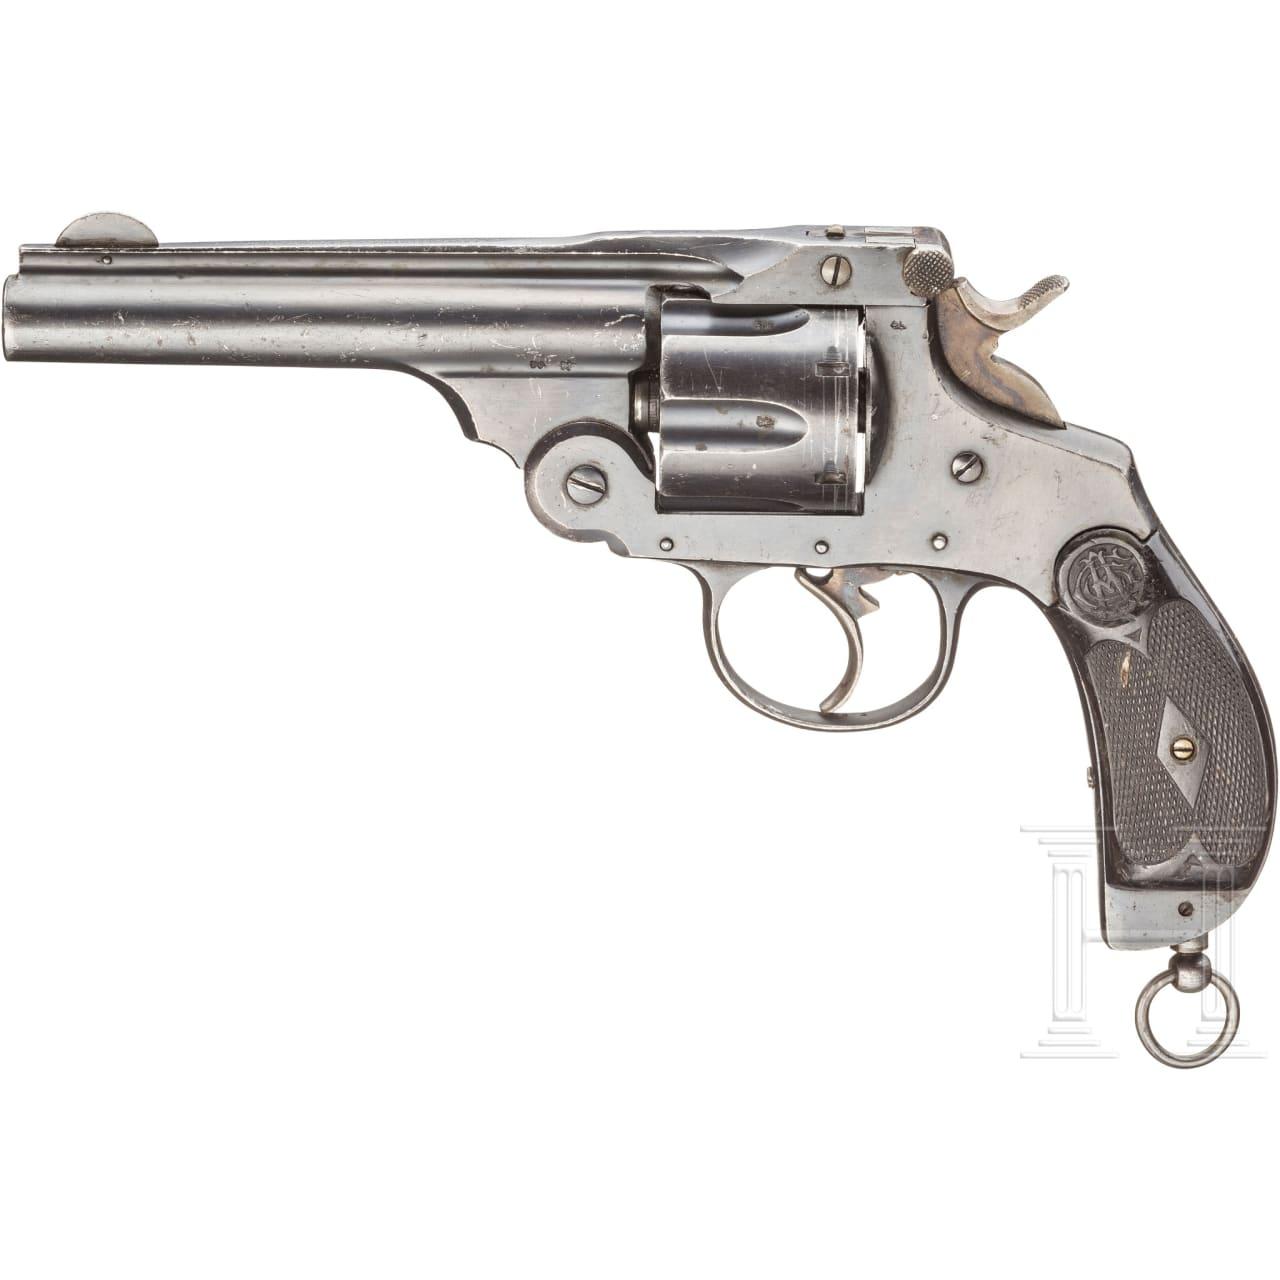 "Garate Tipo Smith Mod. 1915 (Pistol O.P. with 5"" Barrel No. 1 Mark I)"